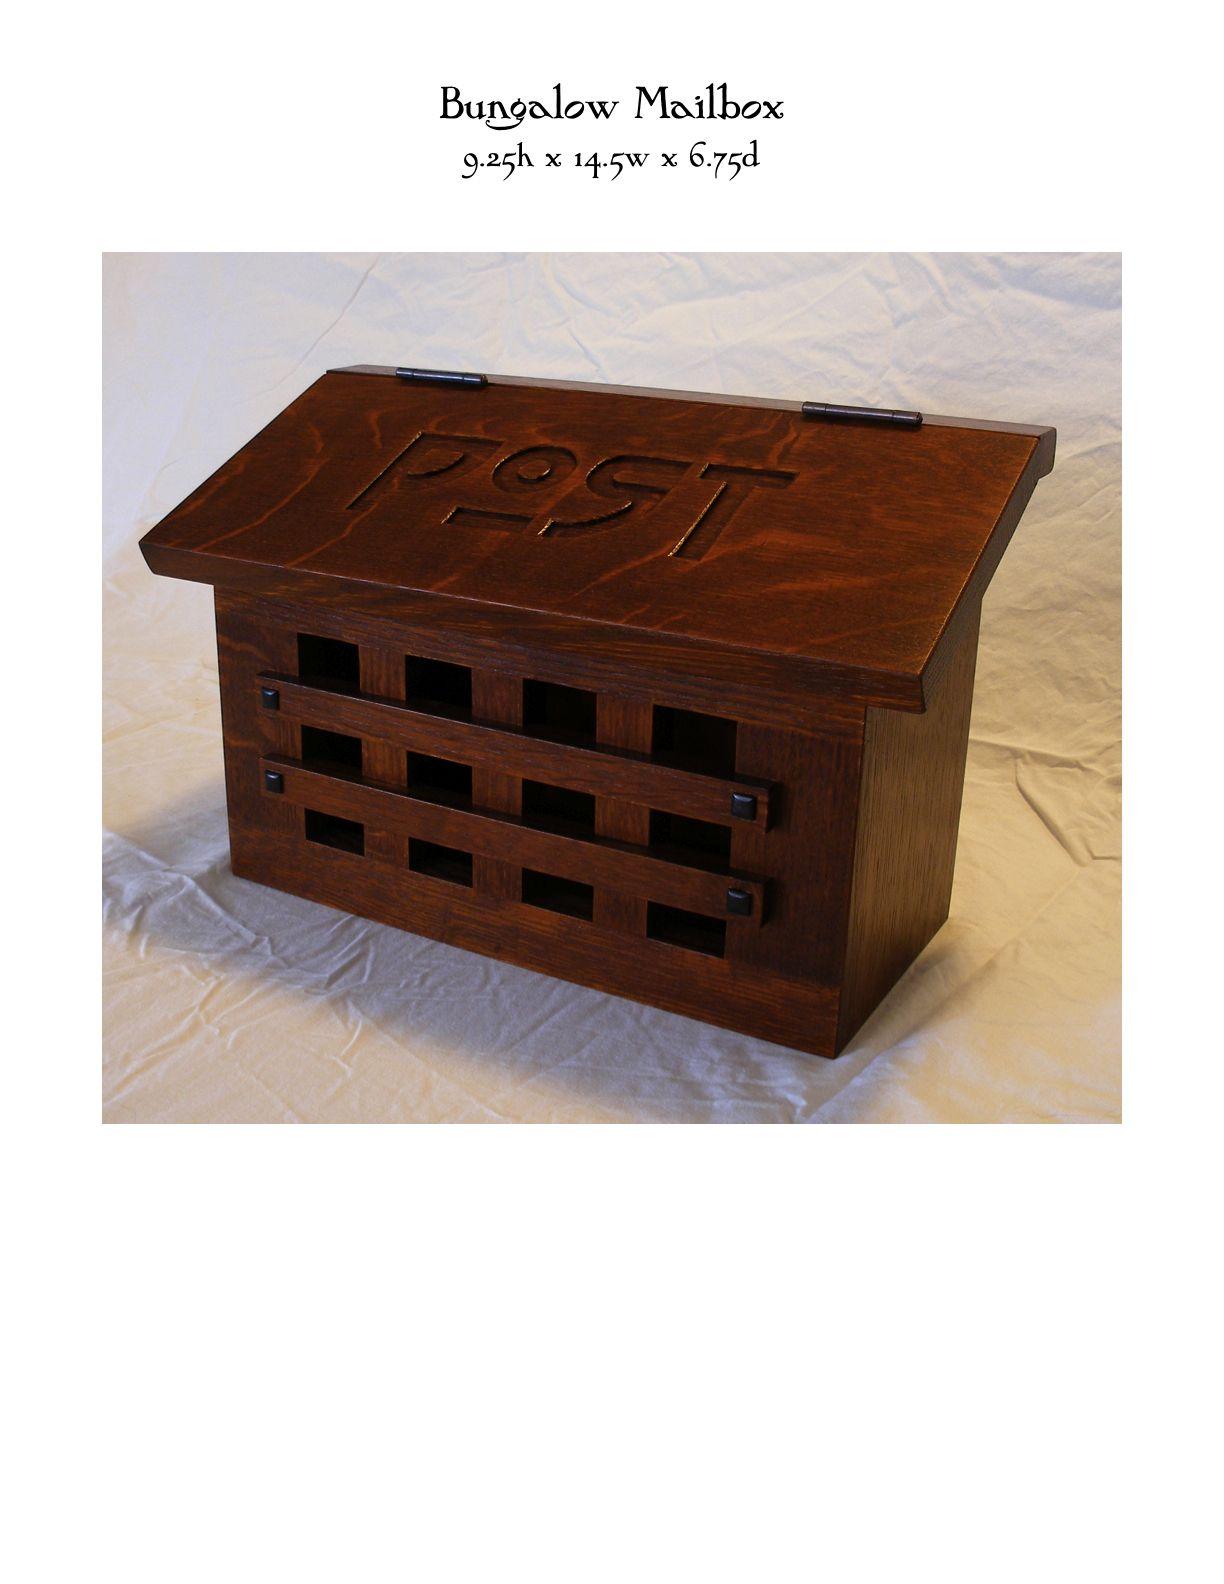 Bungalow Mailbox Mike Devlin Furniture Design Post Box